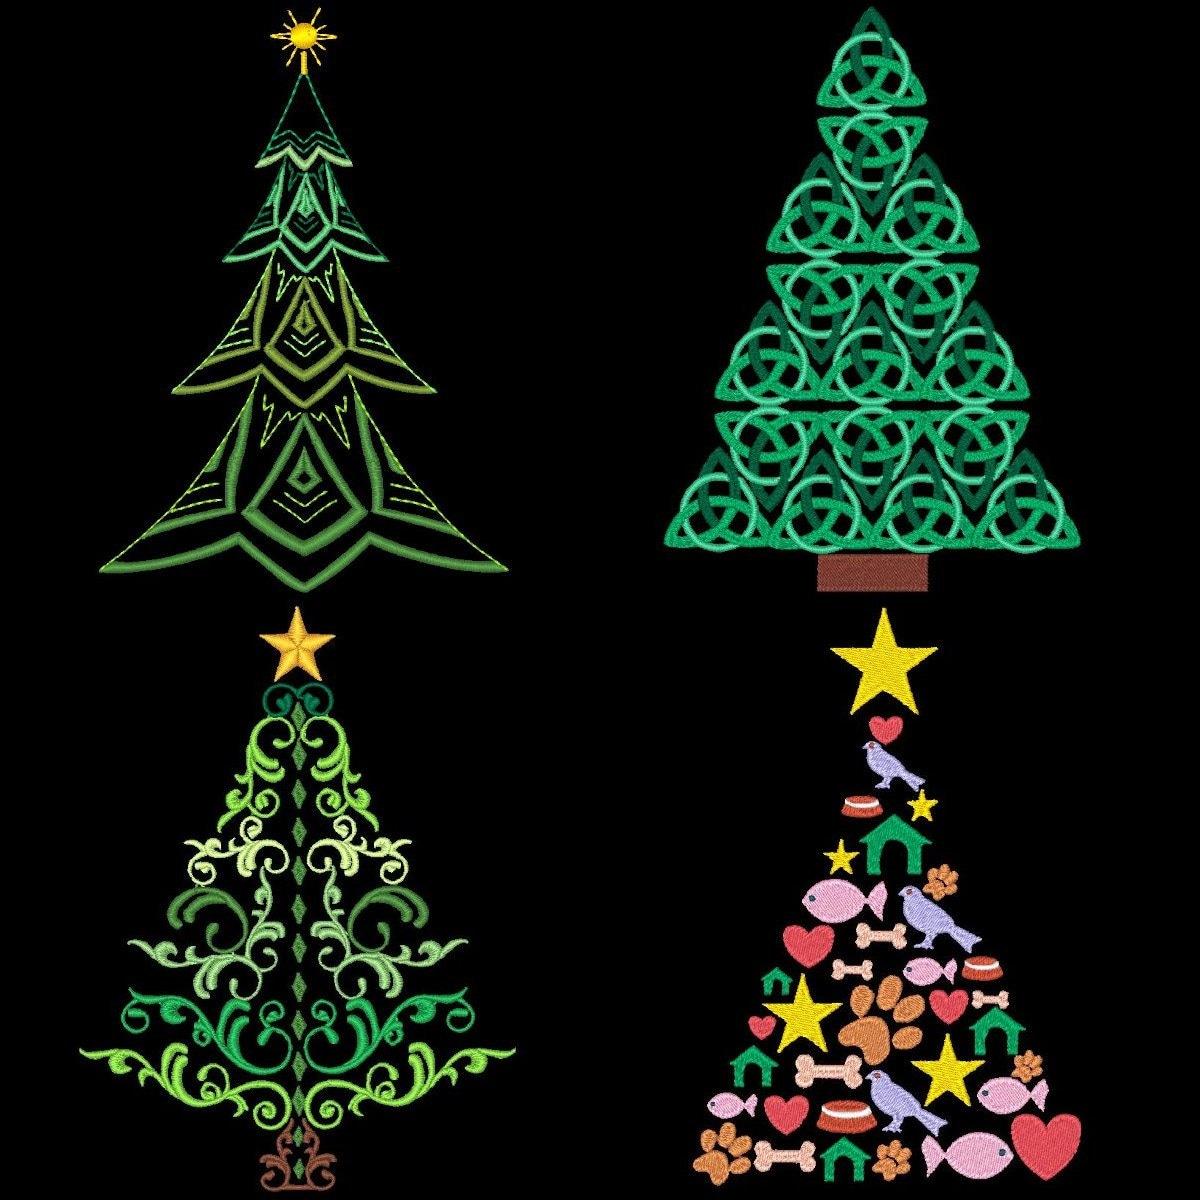 CHRISTMAS TREE MEDLEY No. 2 36 Machine Embroidery Designs